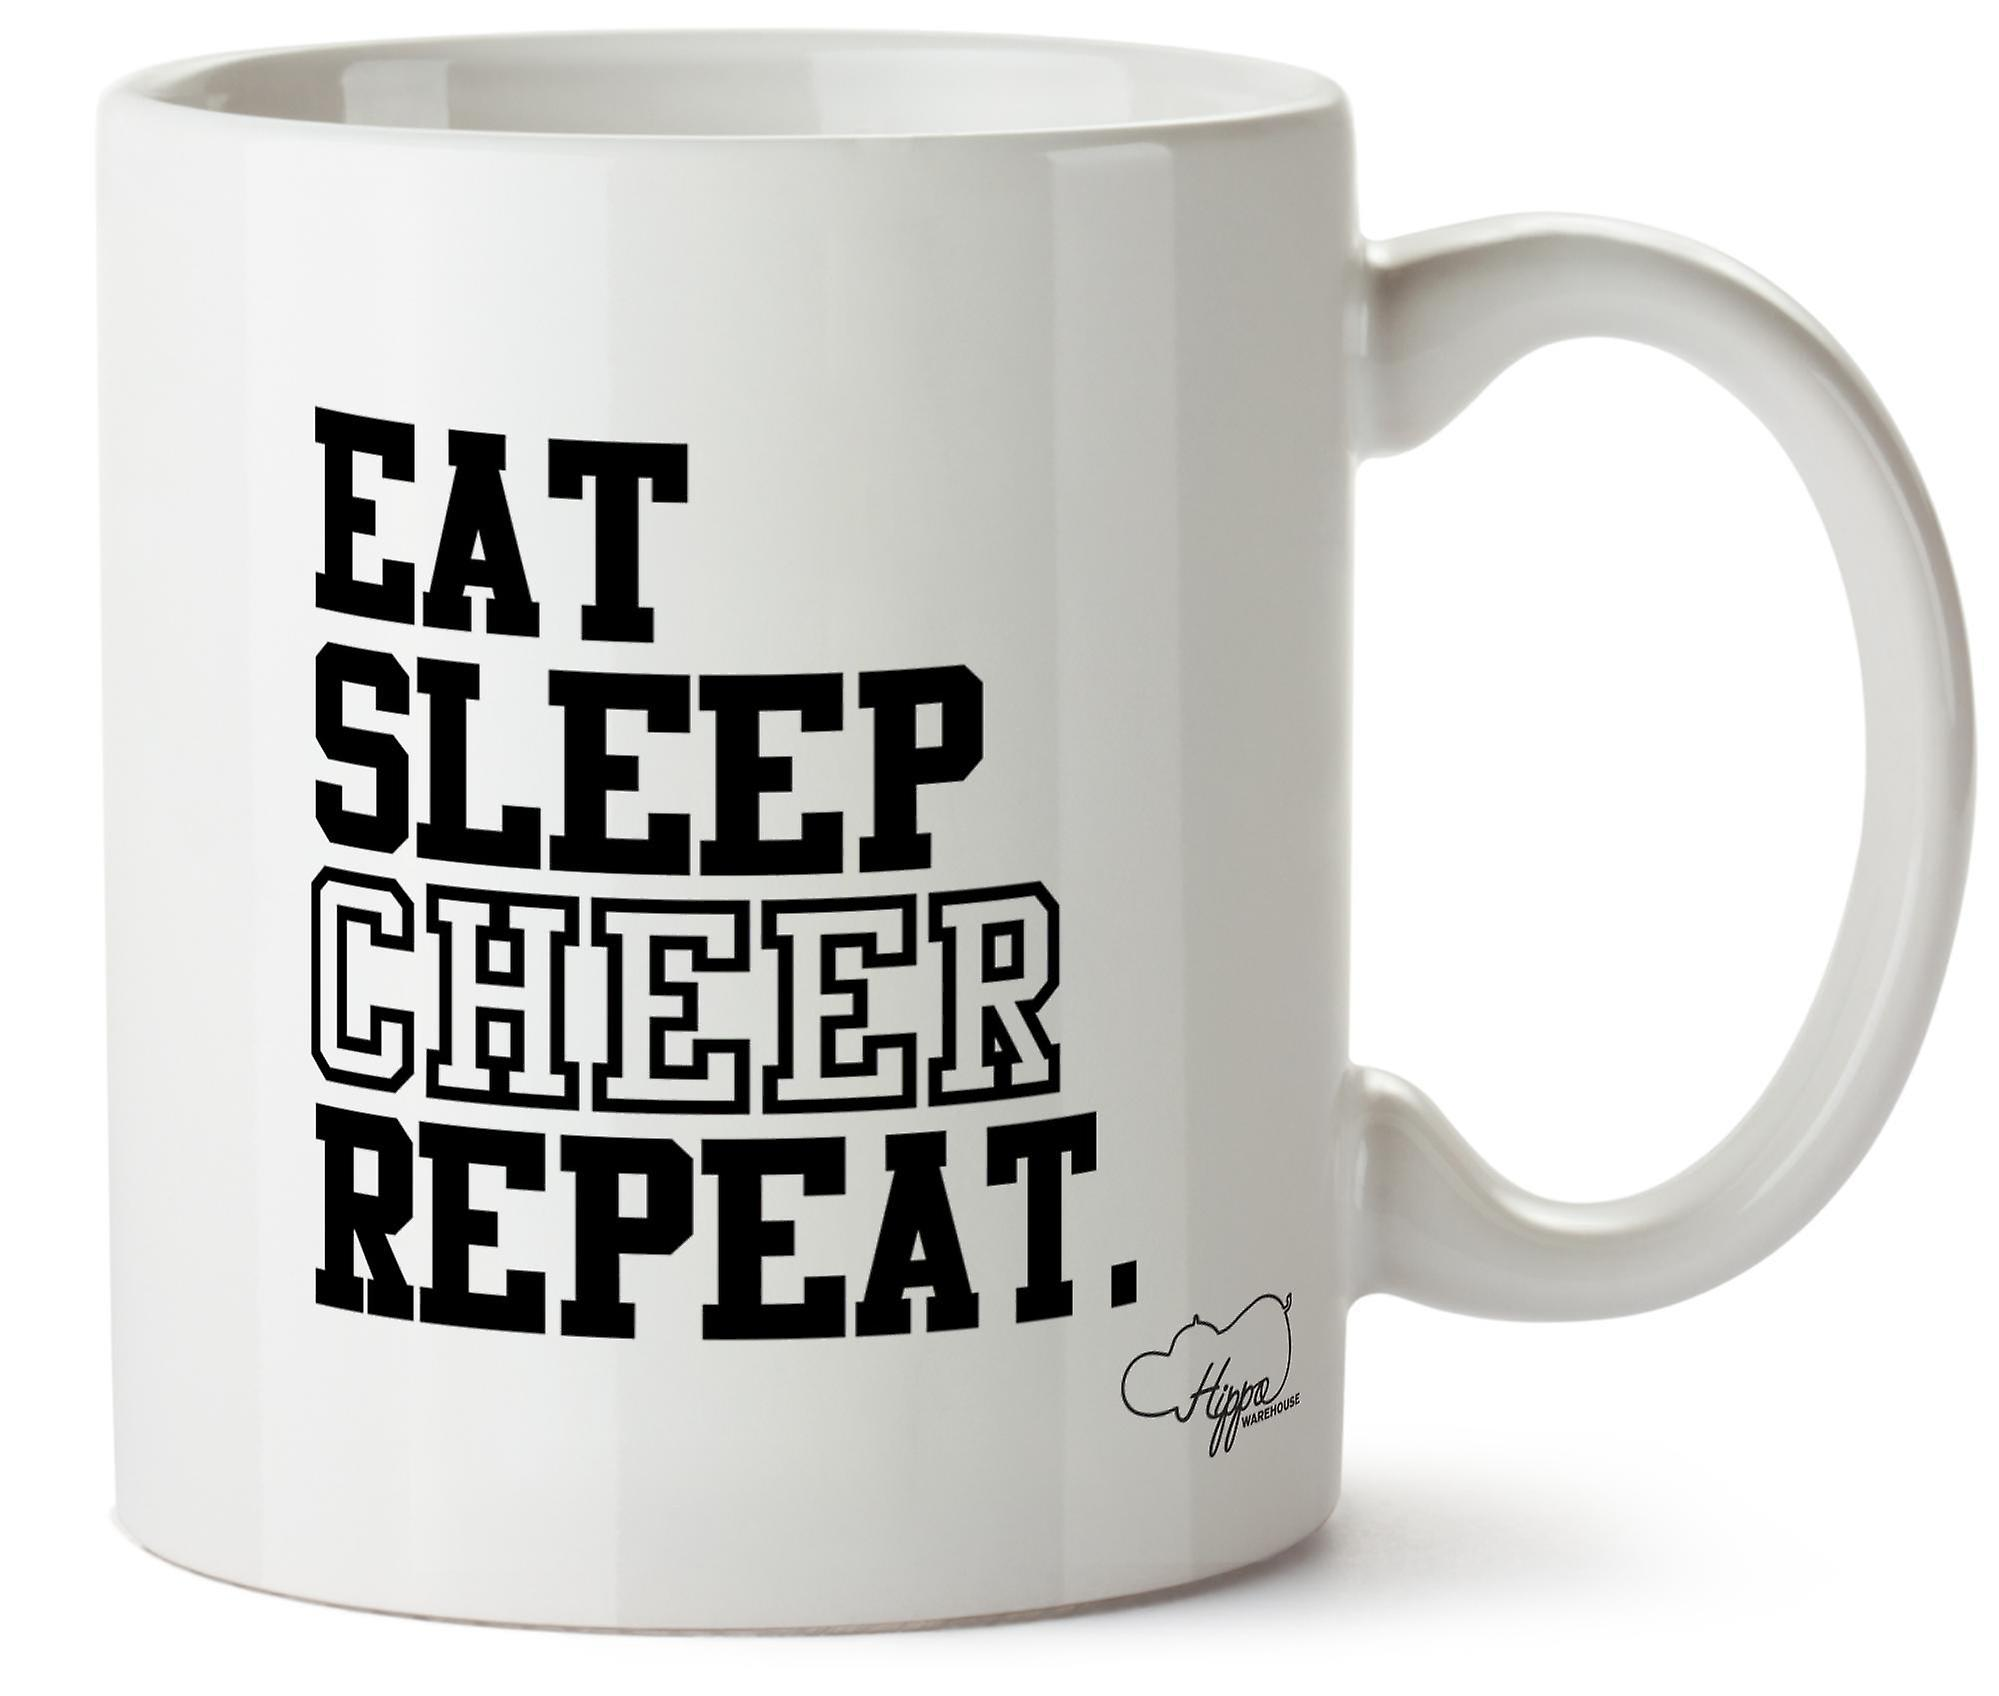 Hippowarehouse Eat Sleep Cheer Repeat Cheerleading 10oz Mug Cup